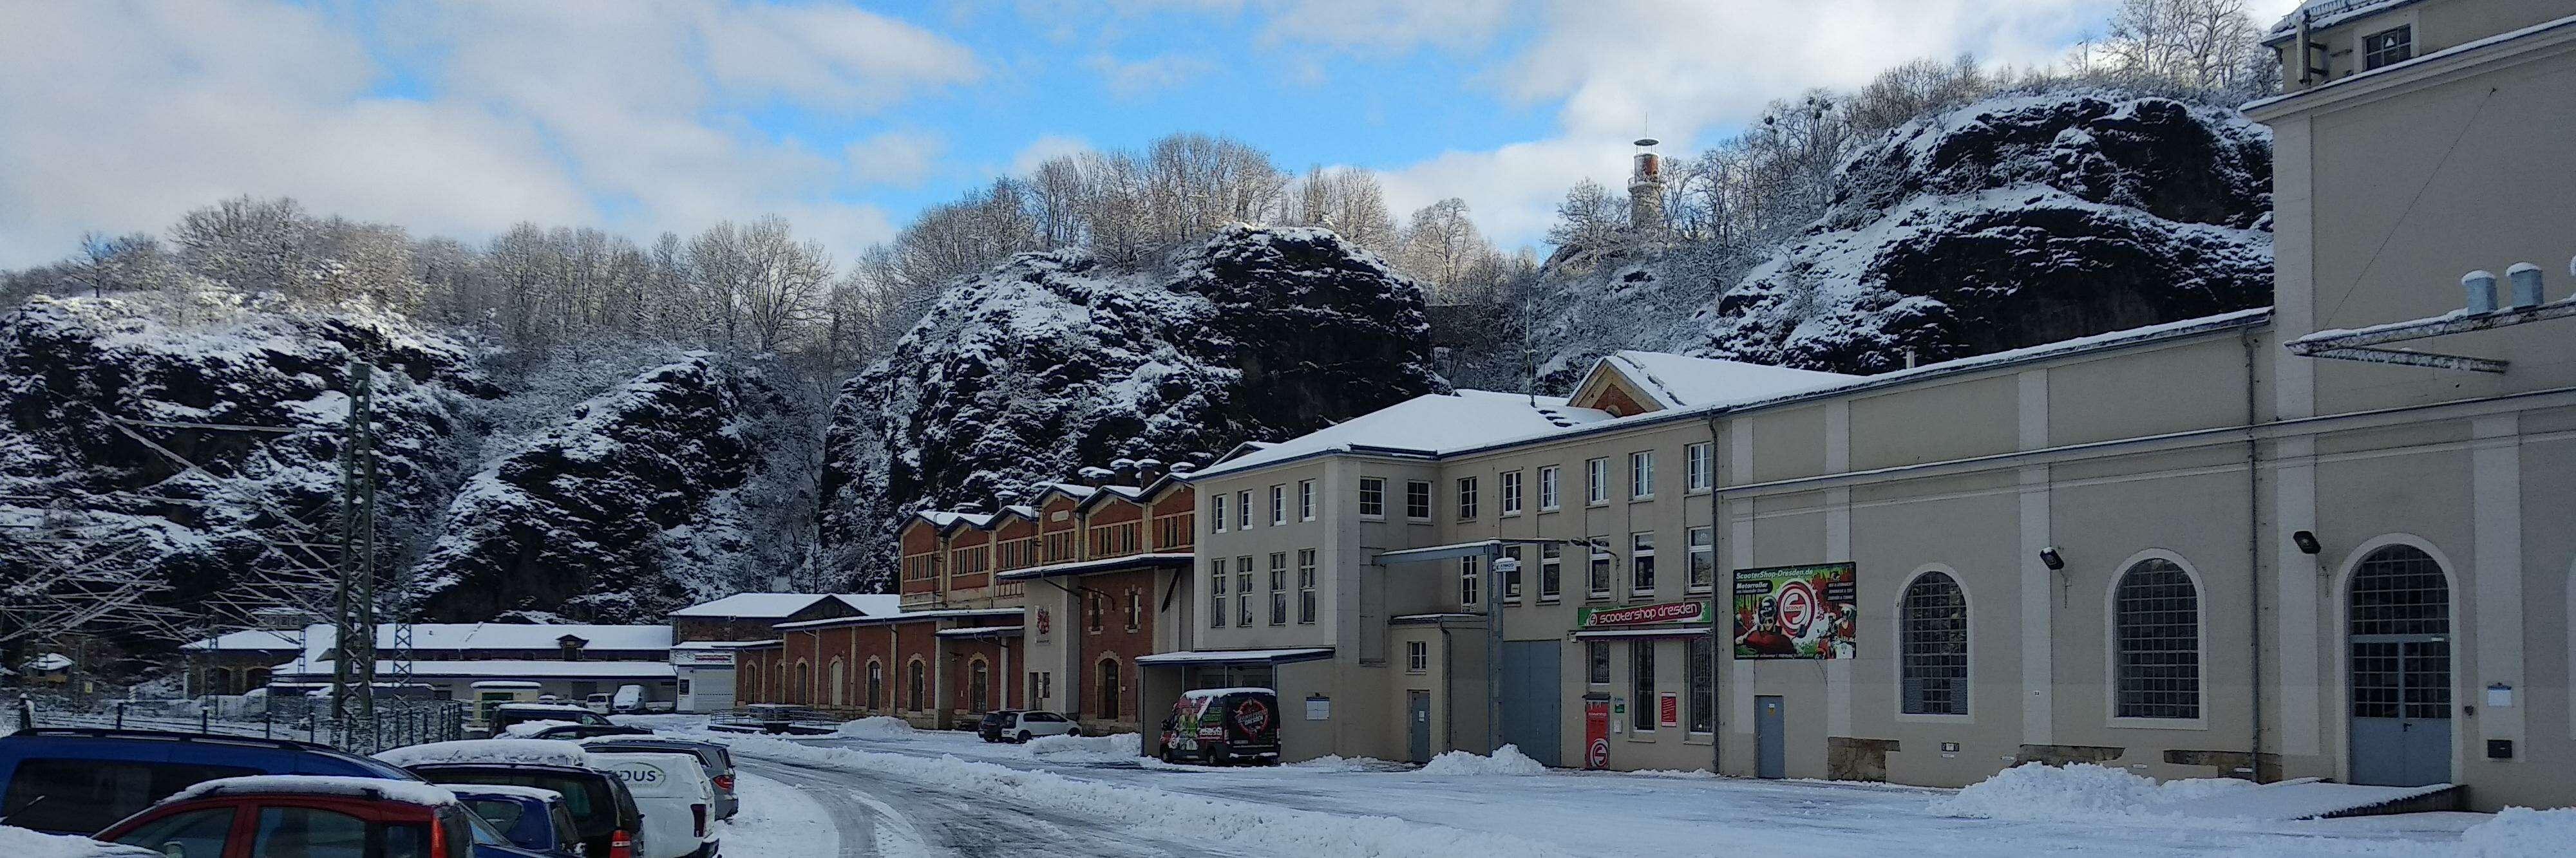 Airclip Büro im Winter